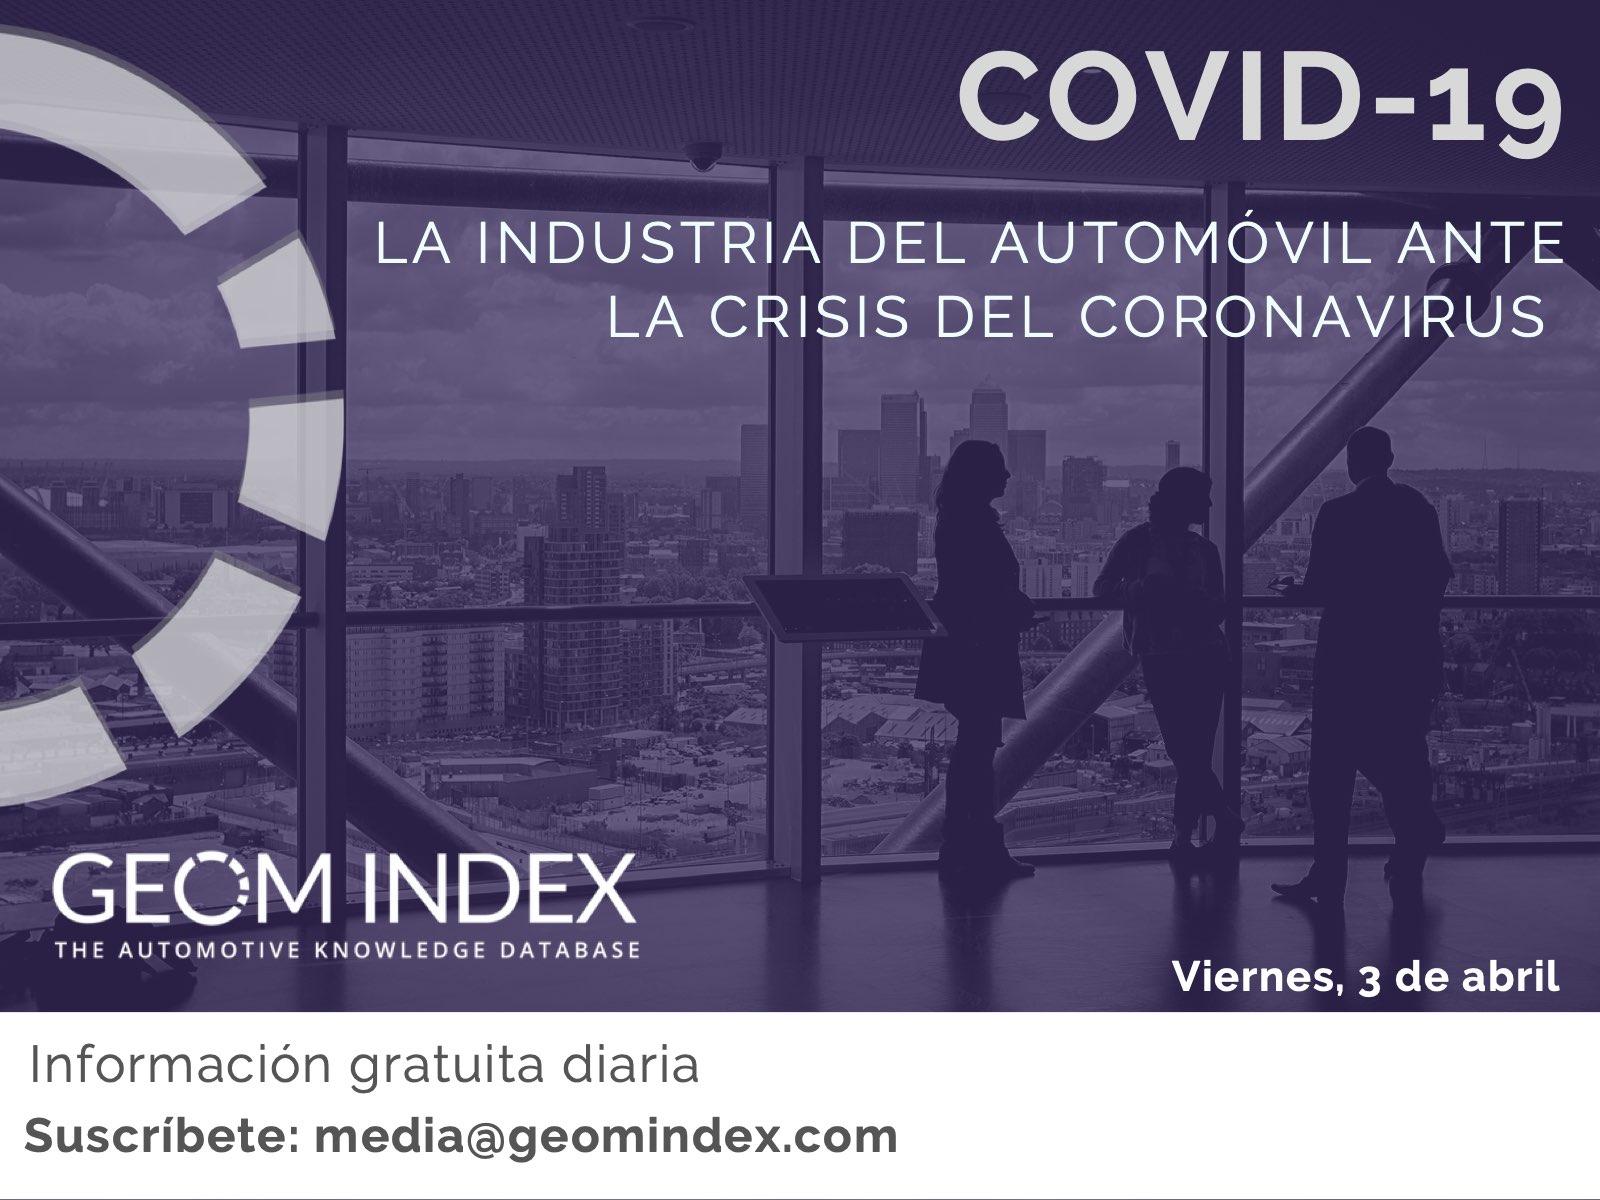 Informe 3/04/2020 – La industria del automóvil ante la crisis del Covid-19